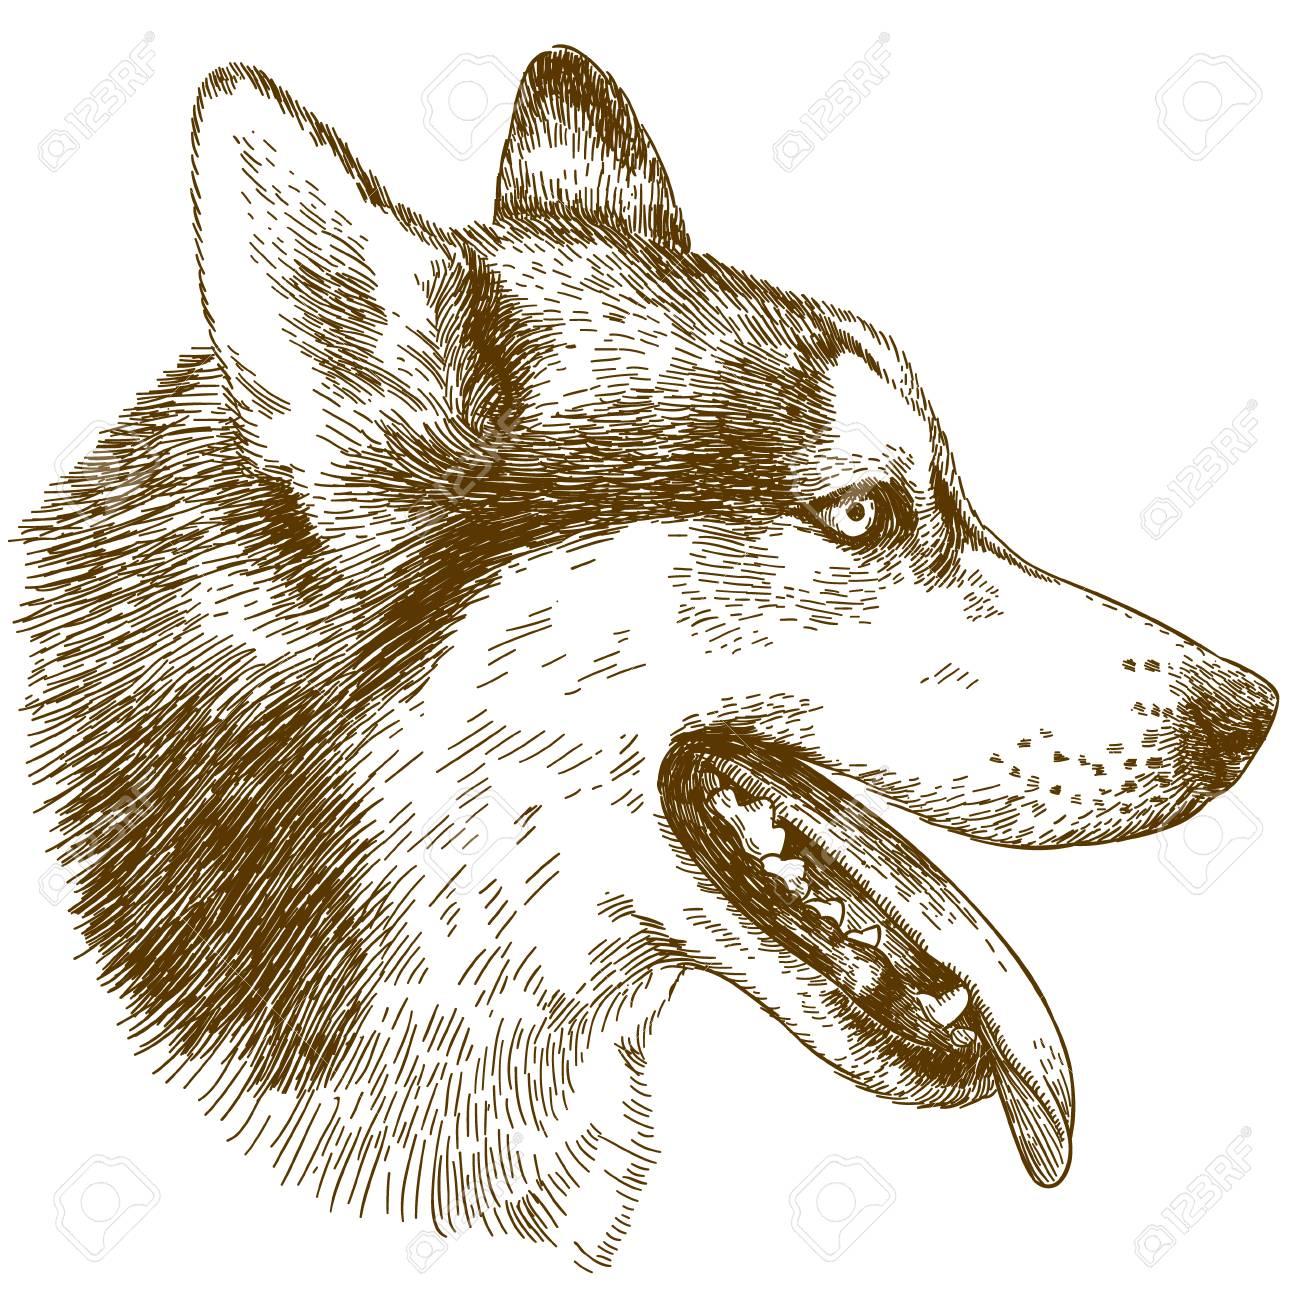 Vector Antique Engraving Drawing Illustration Of Husky Dog Head